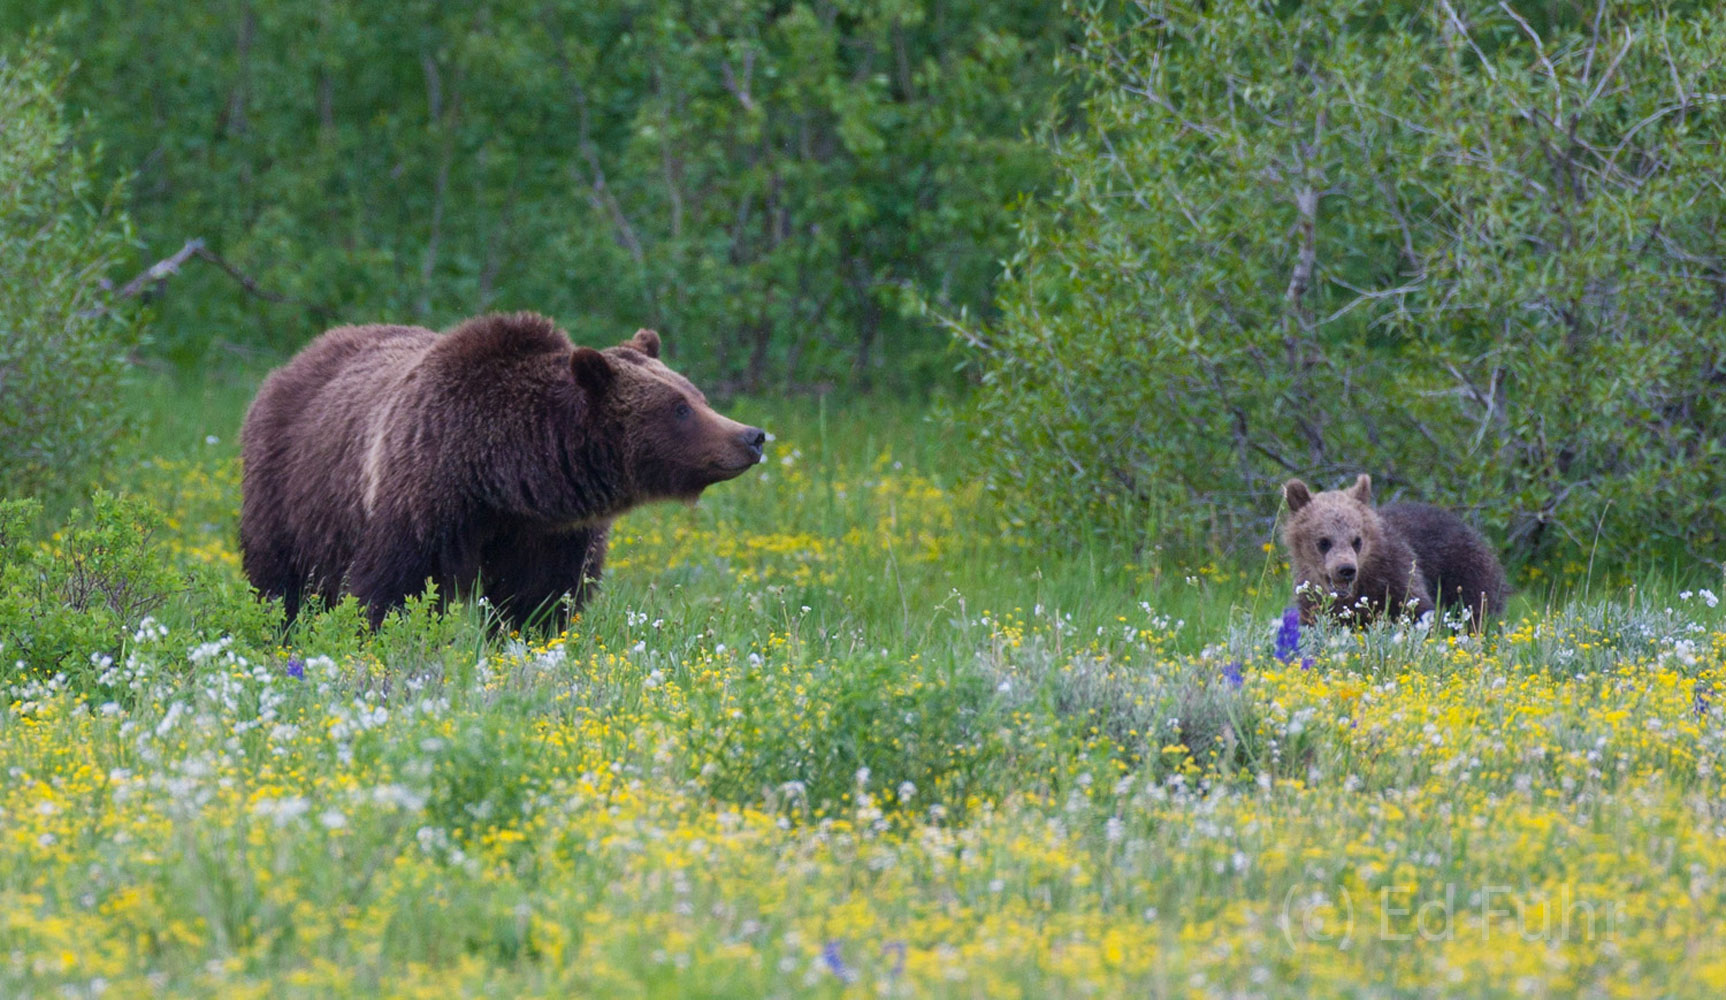 grand teton national park, 2011, grizzly bear, 399, photograph, image, summer, photo